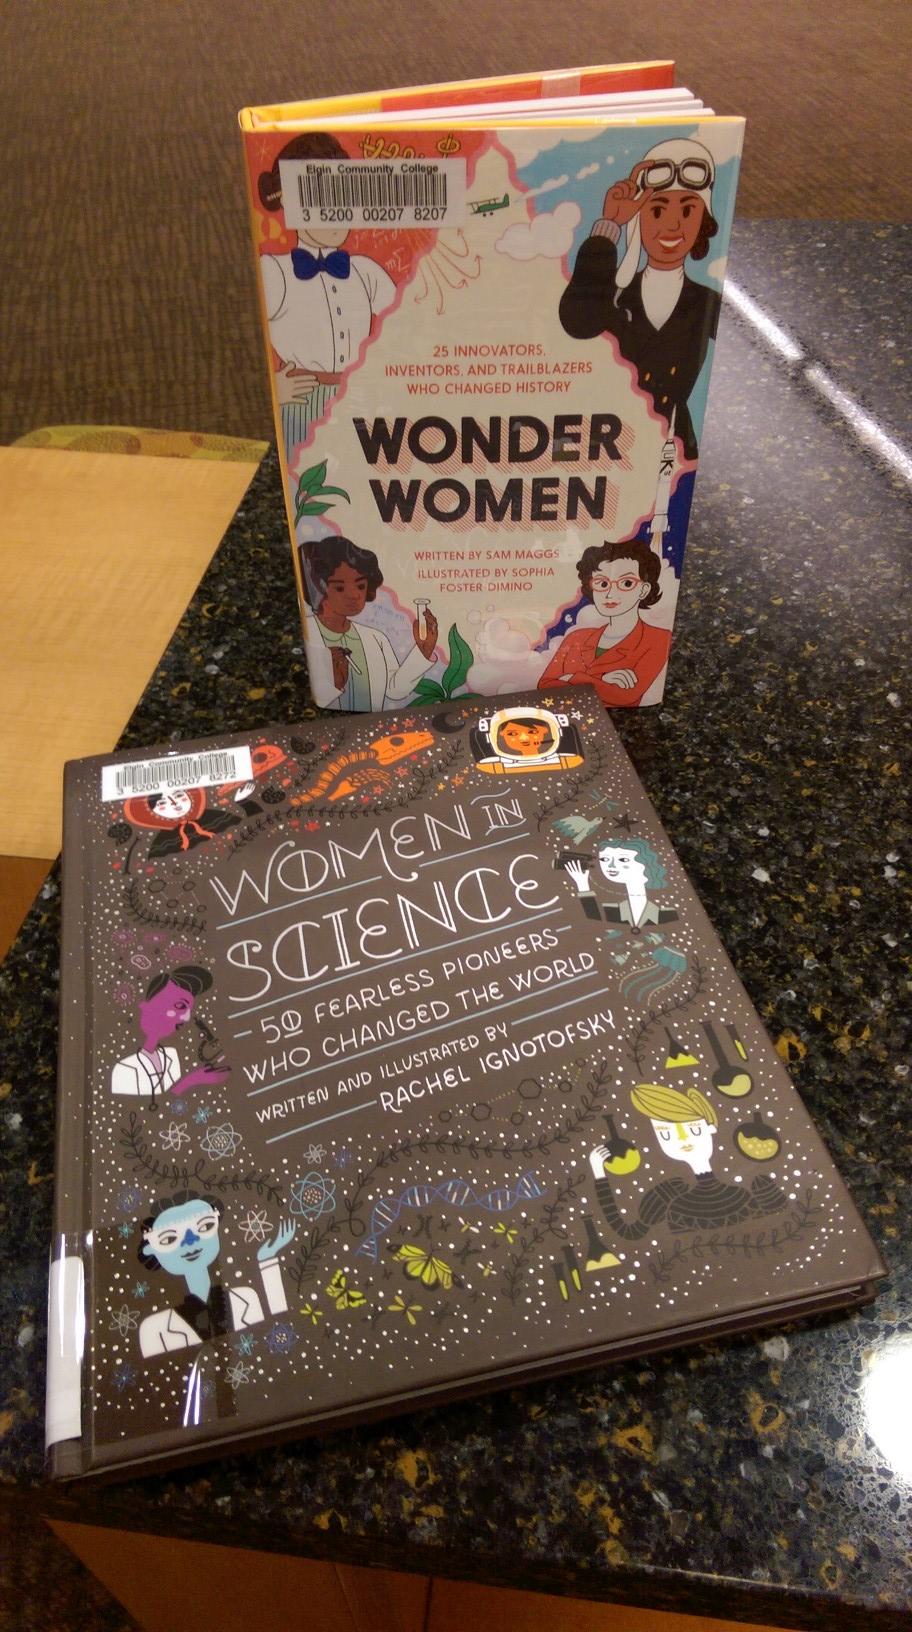 Womanbooks